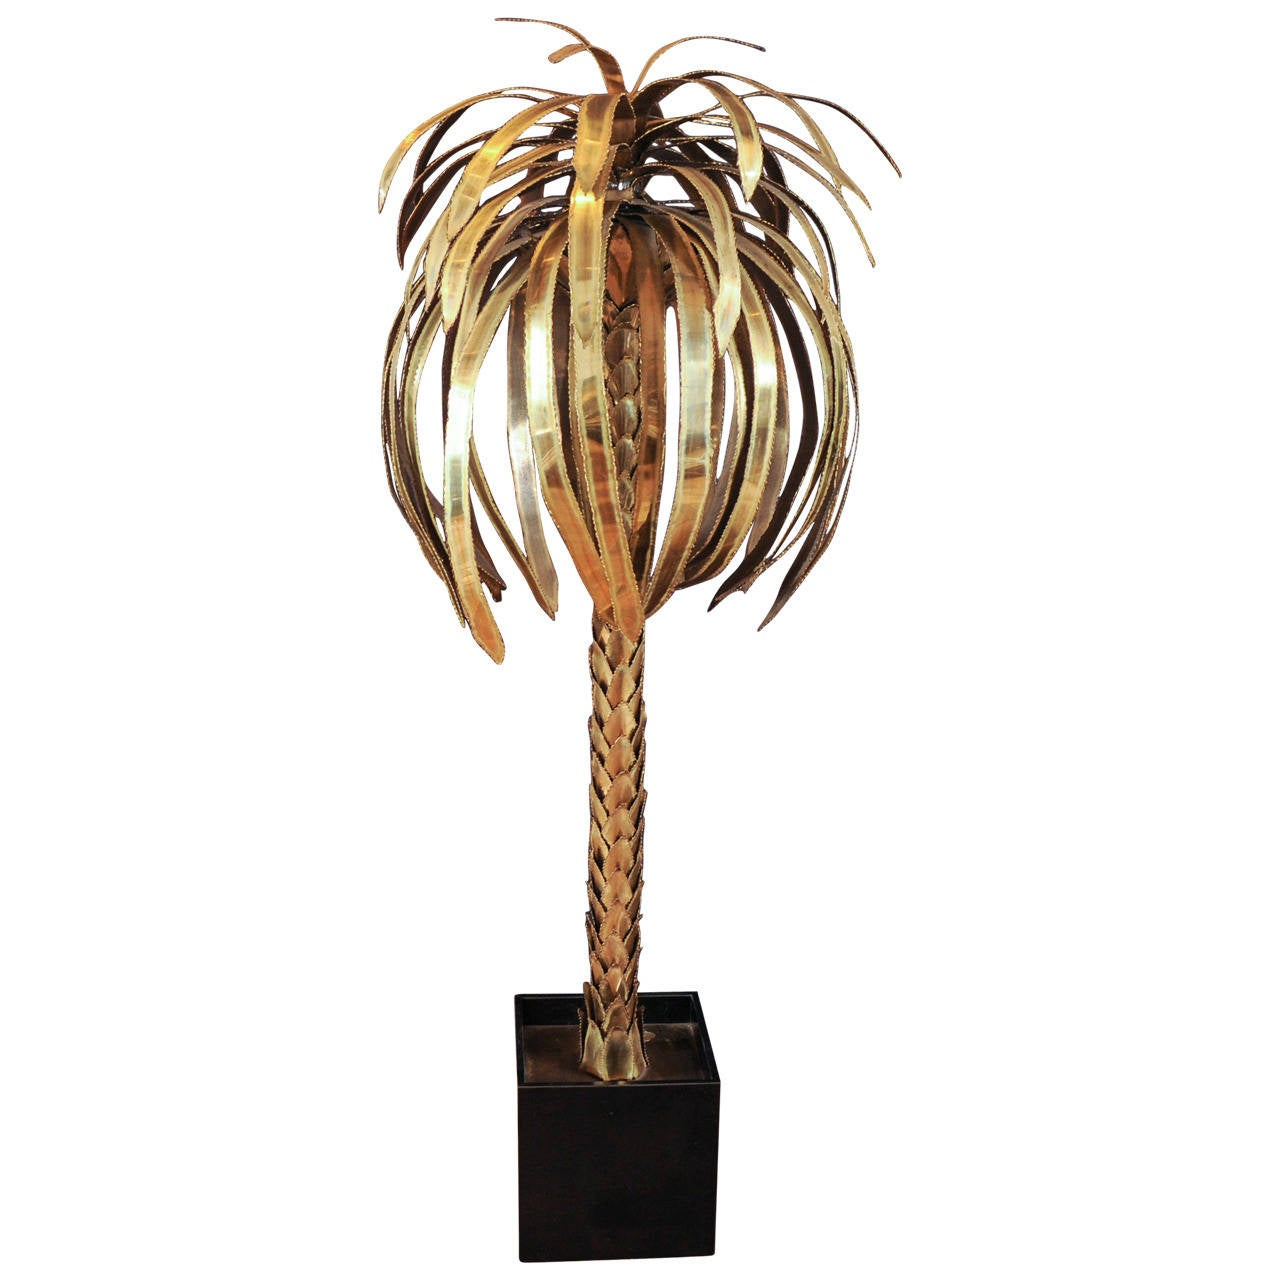 large 1960s maison jansen brass palm tree floor lamp at 1stdibs. Black Bedroom Furniture Sets. Home Design Ideas